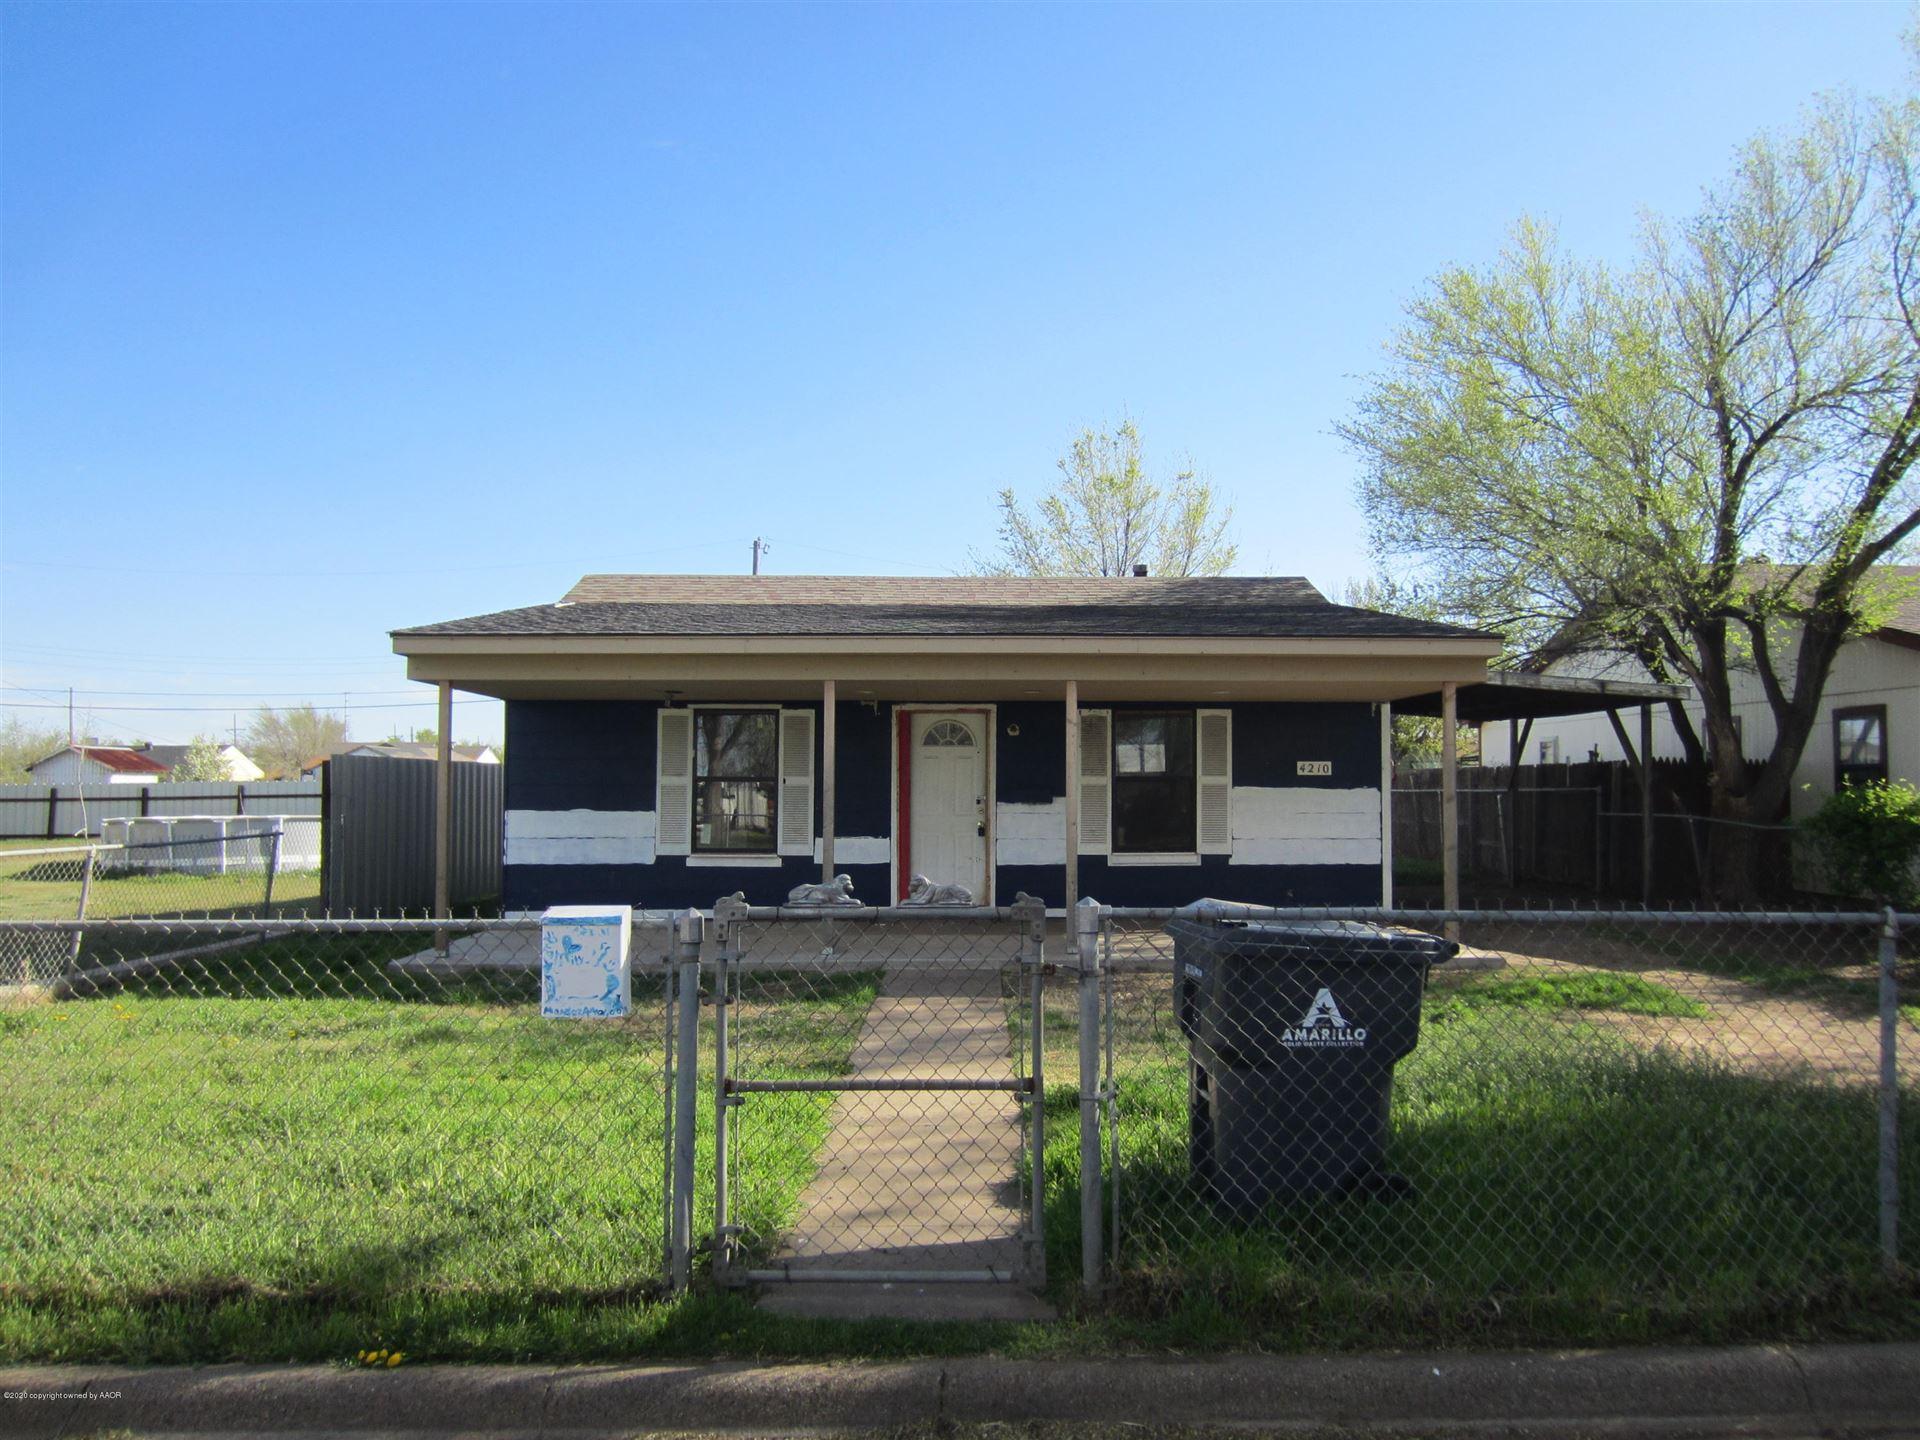 4210 14TH AVE, Amarillo, TX 79107 - #: 20-2102